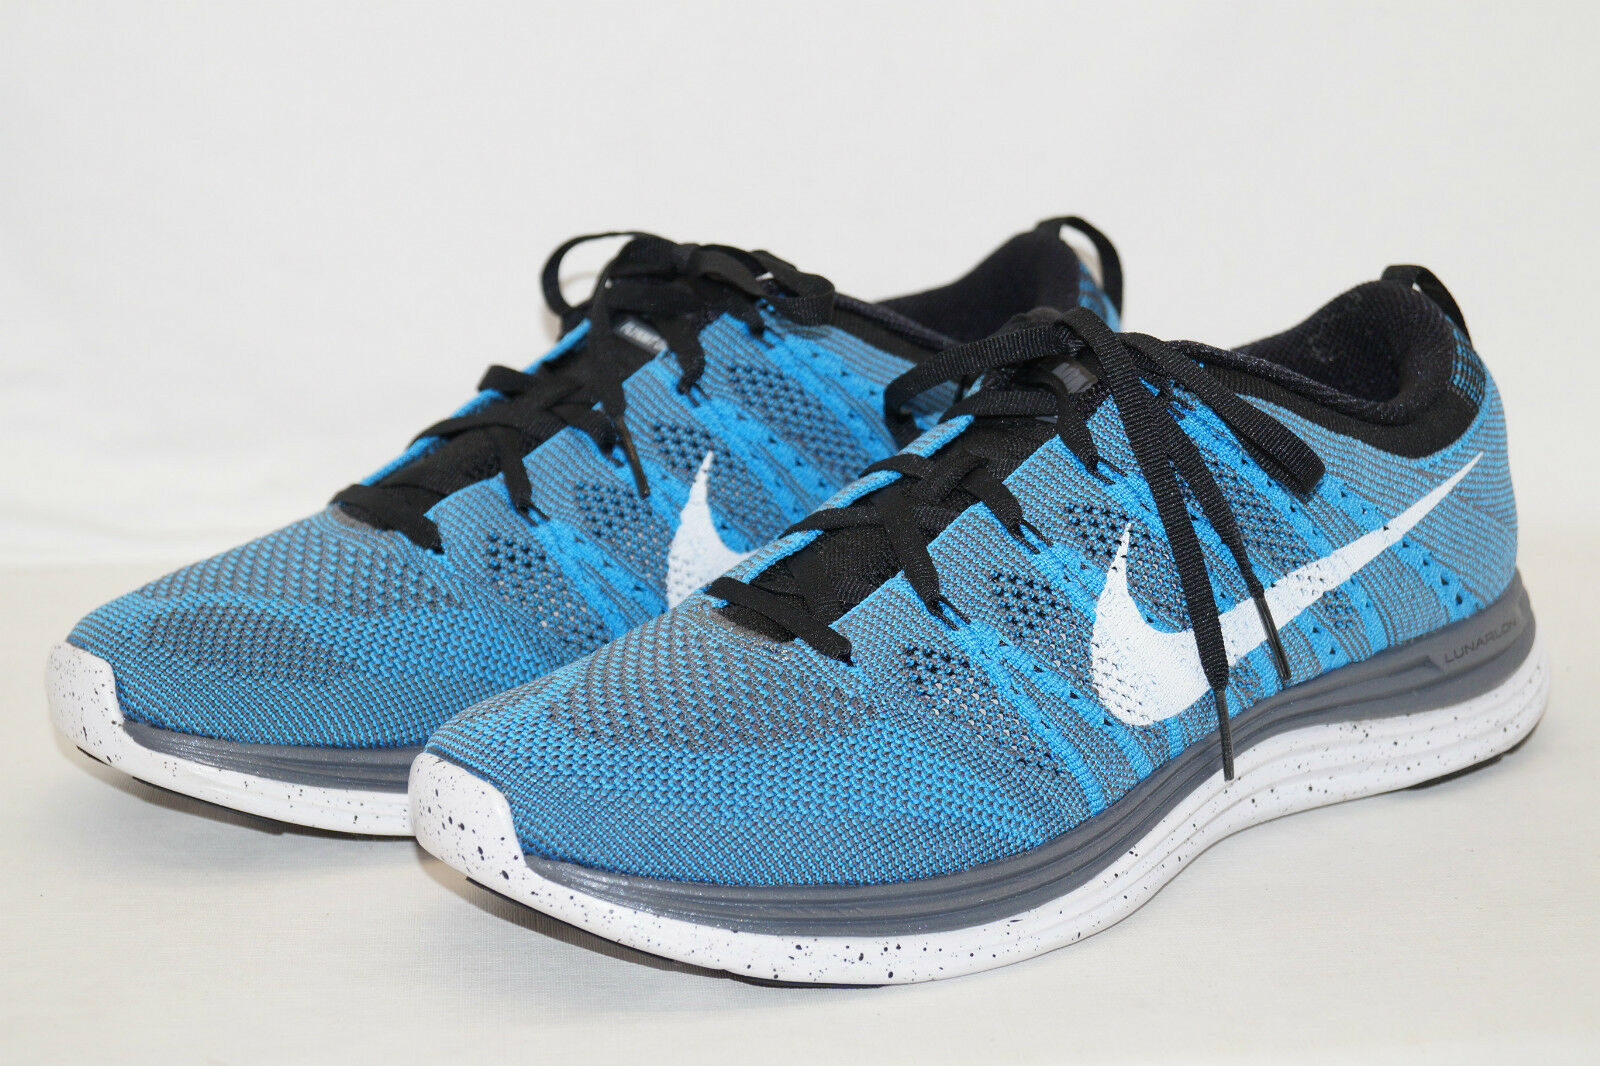 Nike flyknite one 1 Lunarlon talla 43 8,5 azul blancoo gris 554887-411